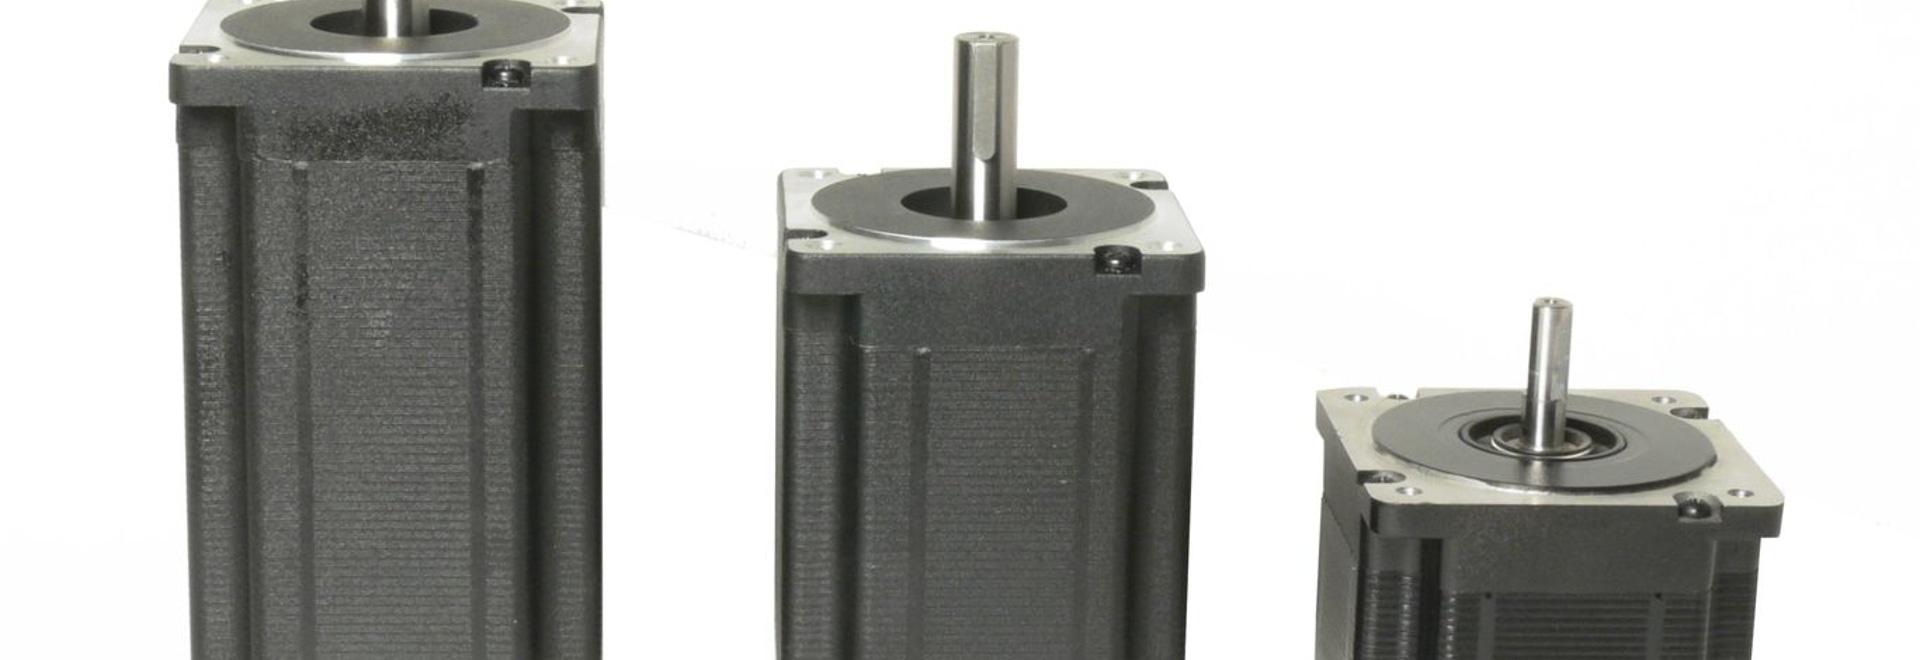 NEW: stepper motor by JVL